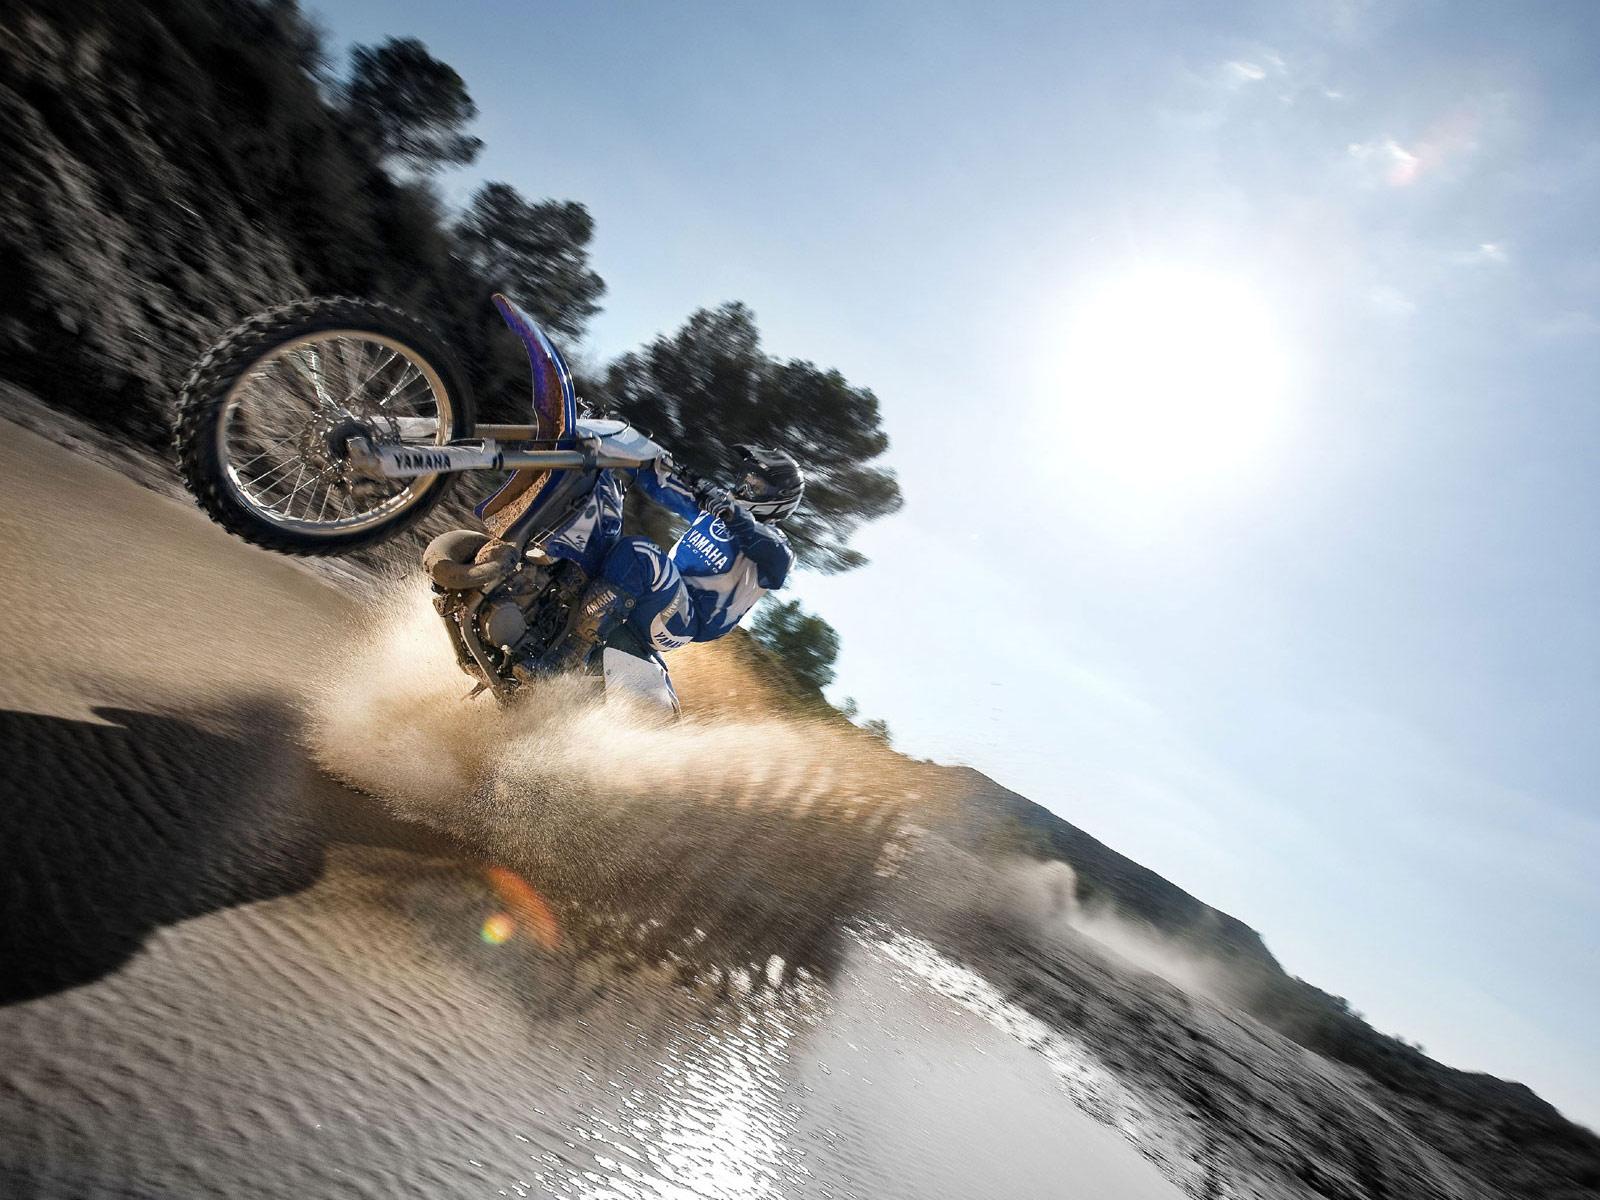 Kawasaki 250 Dirt Bike 4 Stroke Wallpaper For Desktop